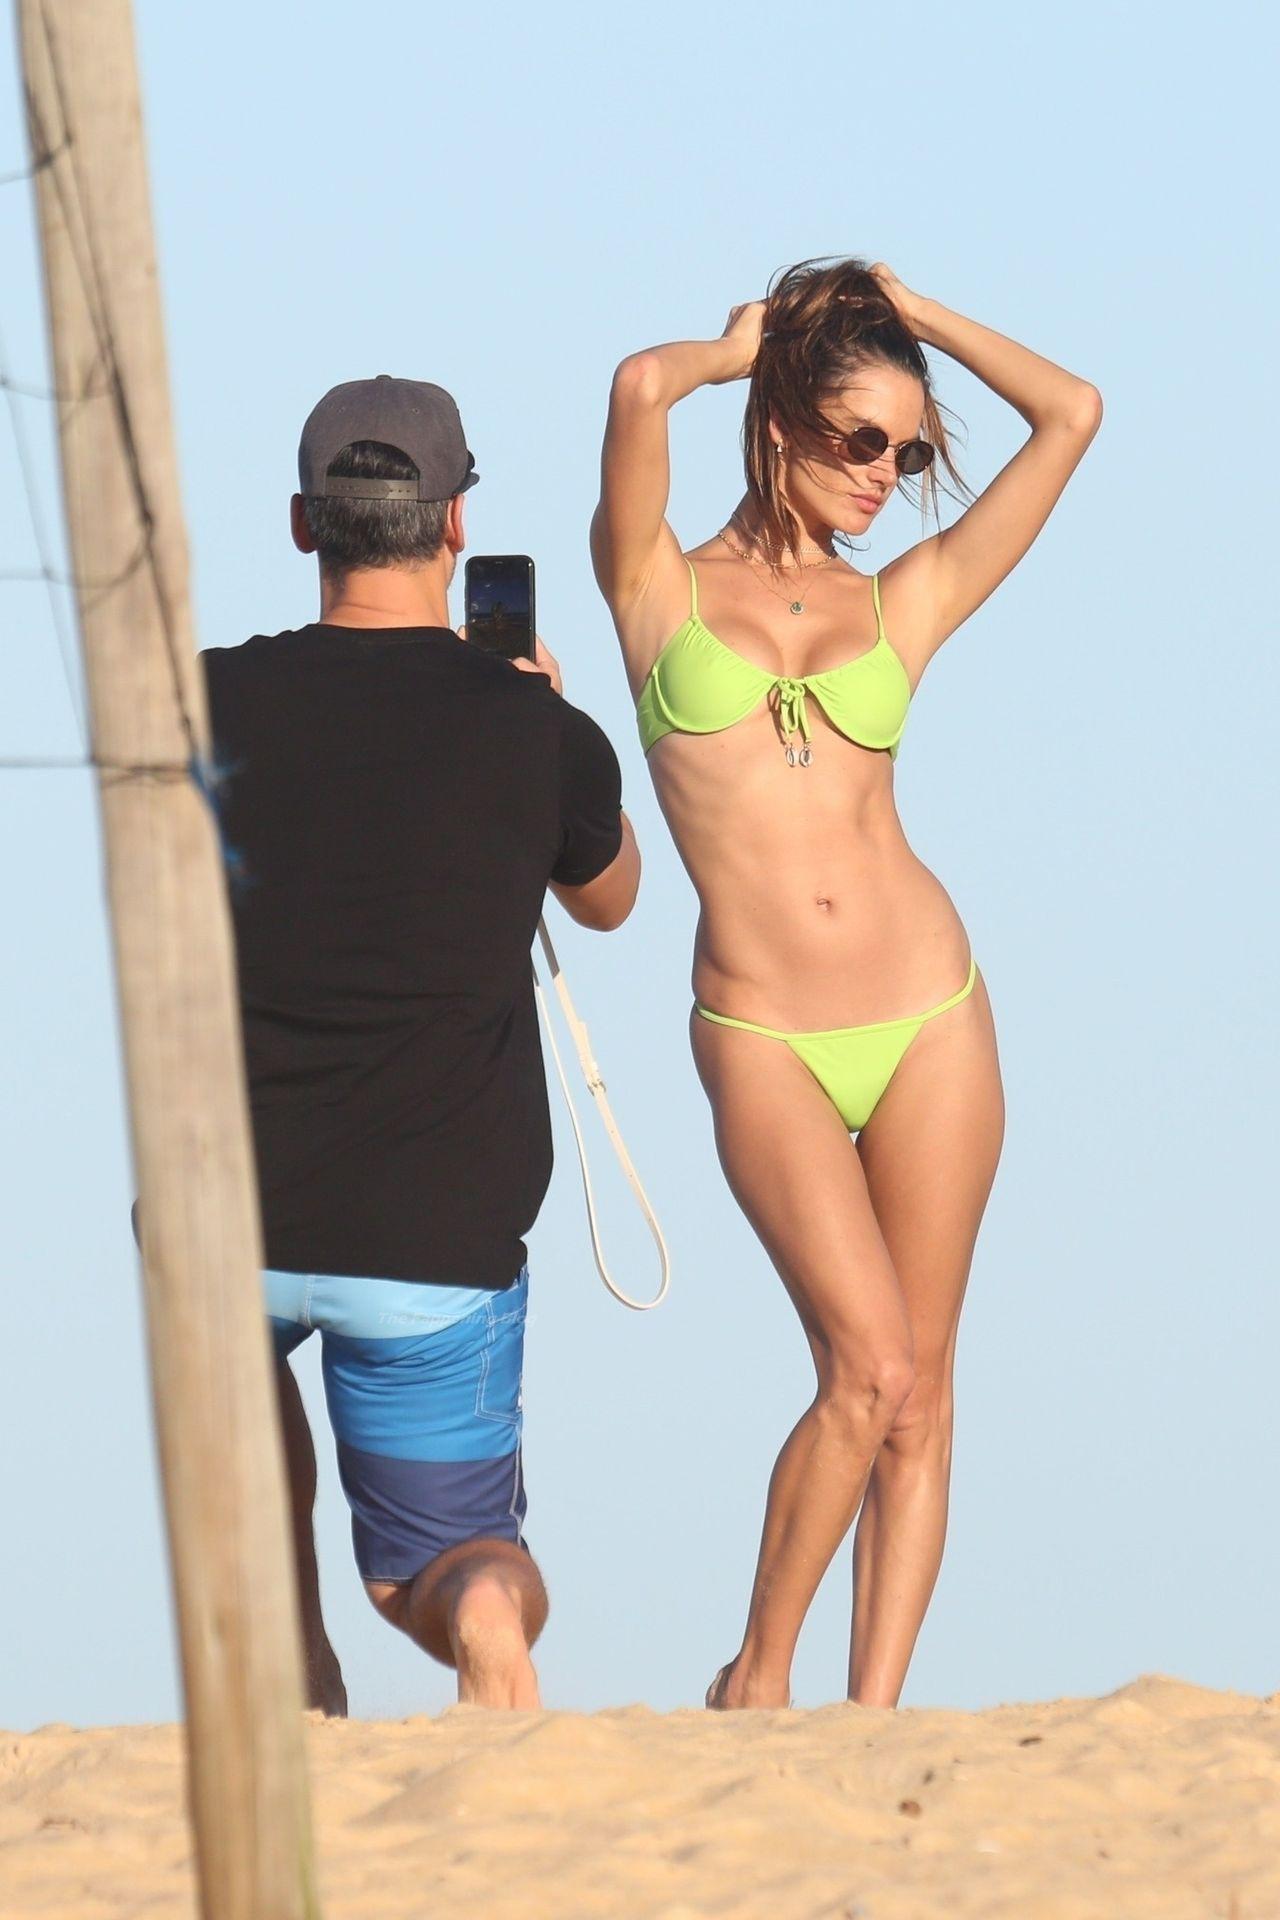 Alessandra-Ambrosio-Sexy-The-Fappening-Blog-601.jpg